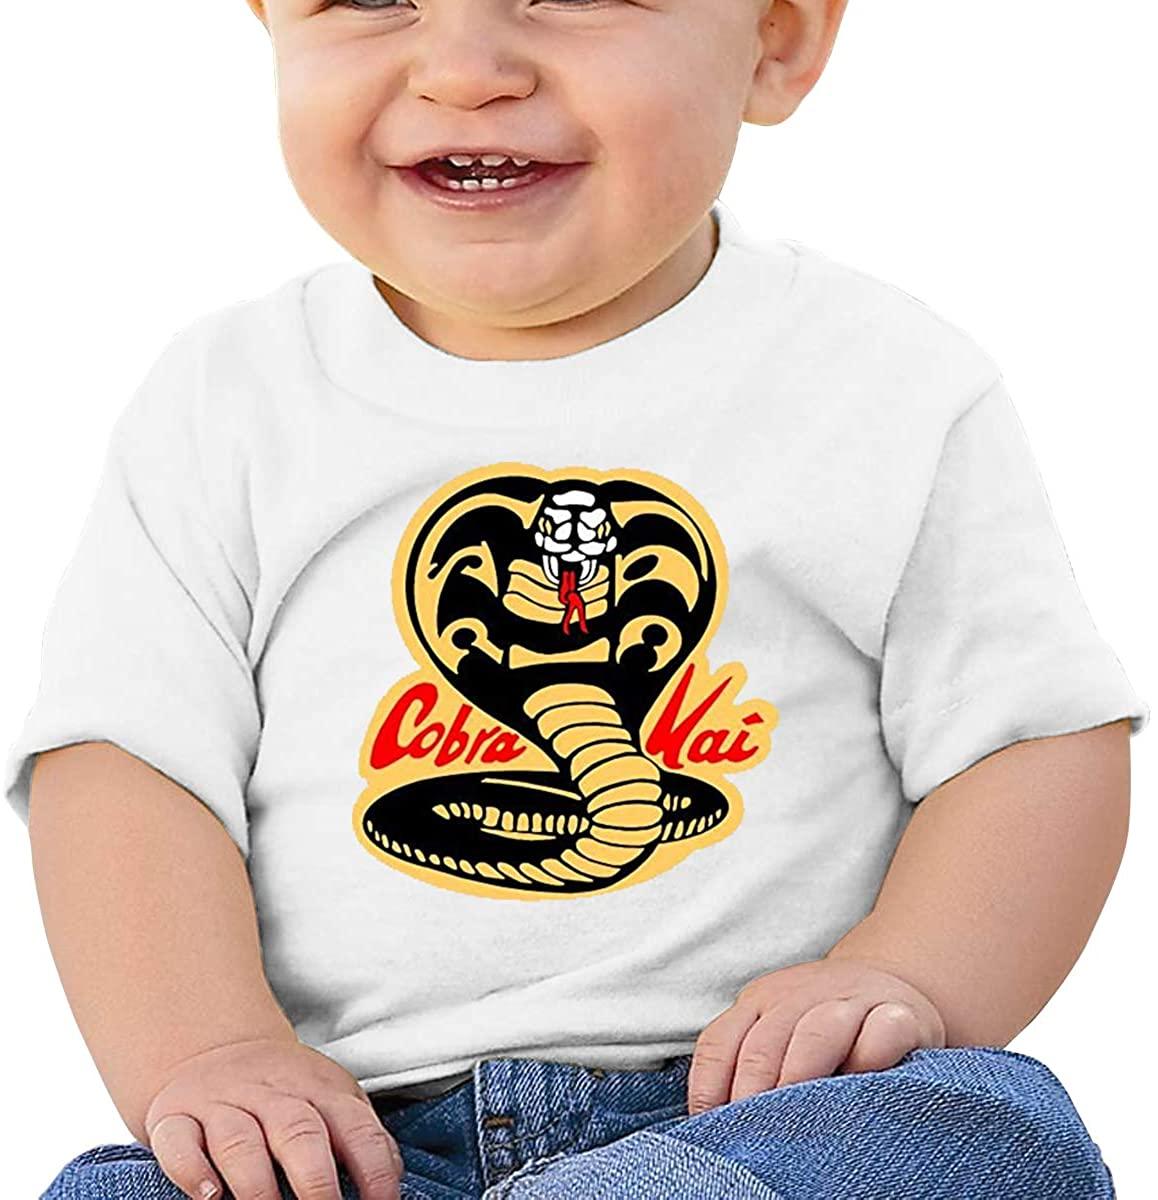 6-24 Months Boy and Girl Baby Short Sleeve T-Shirt Cobra Kai Karate Dojo Elegant and Simple Design White